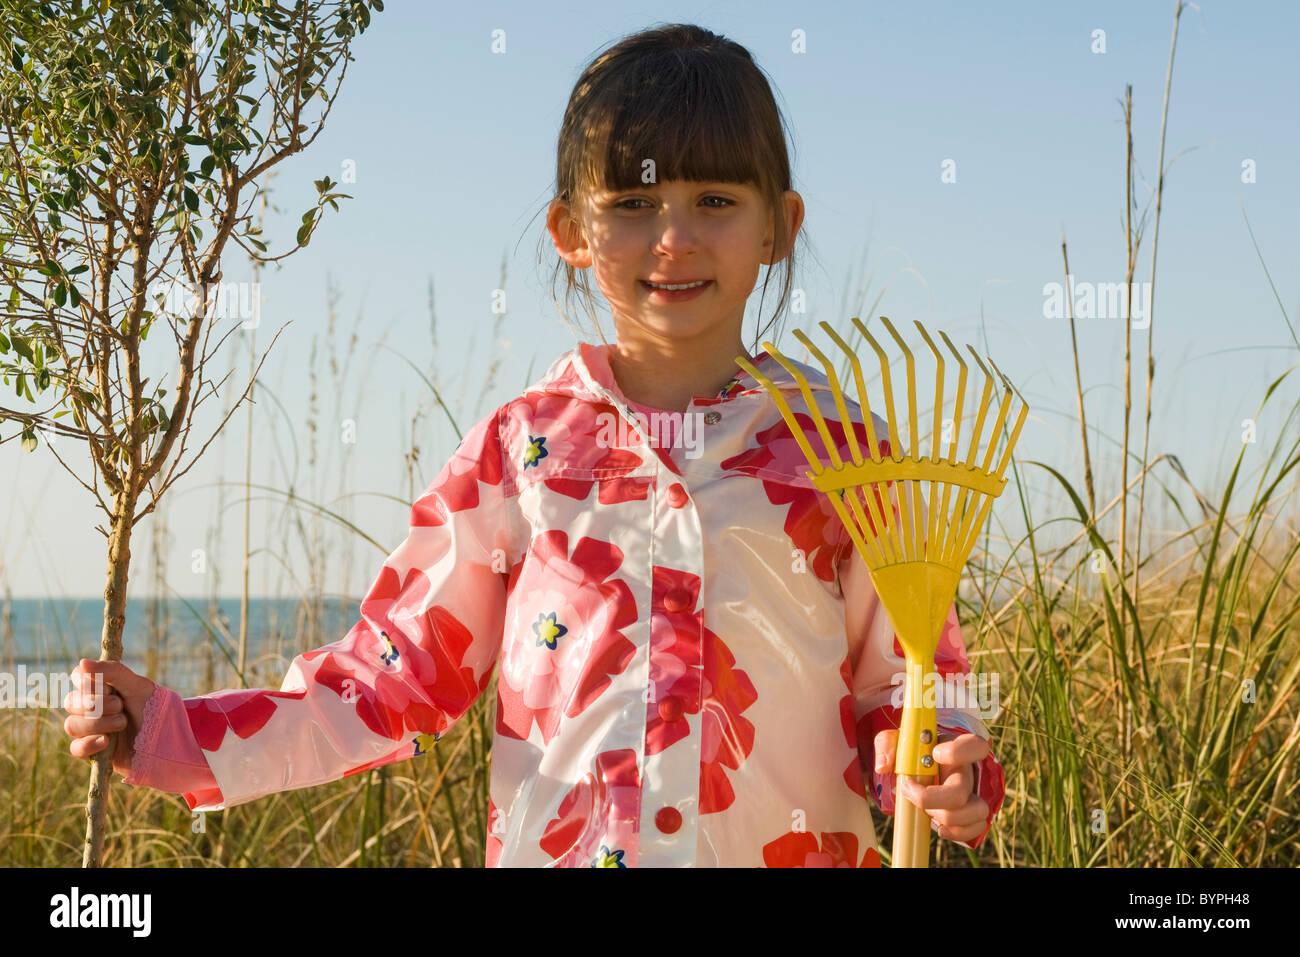 Young girl with gardening rake standing next to tree sapling - Stock Image